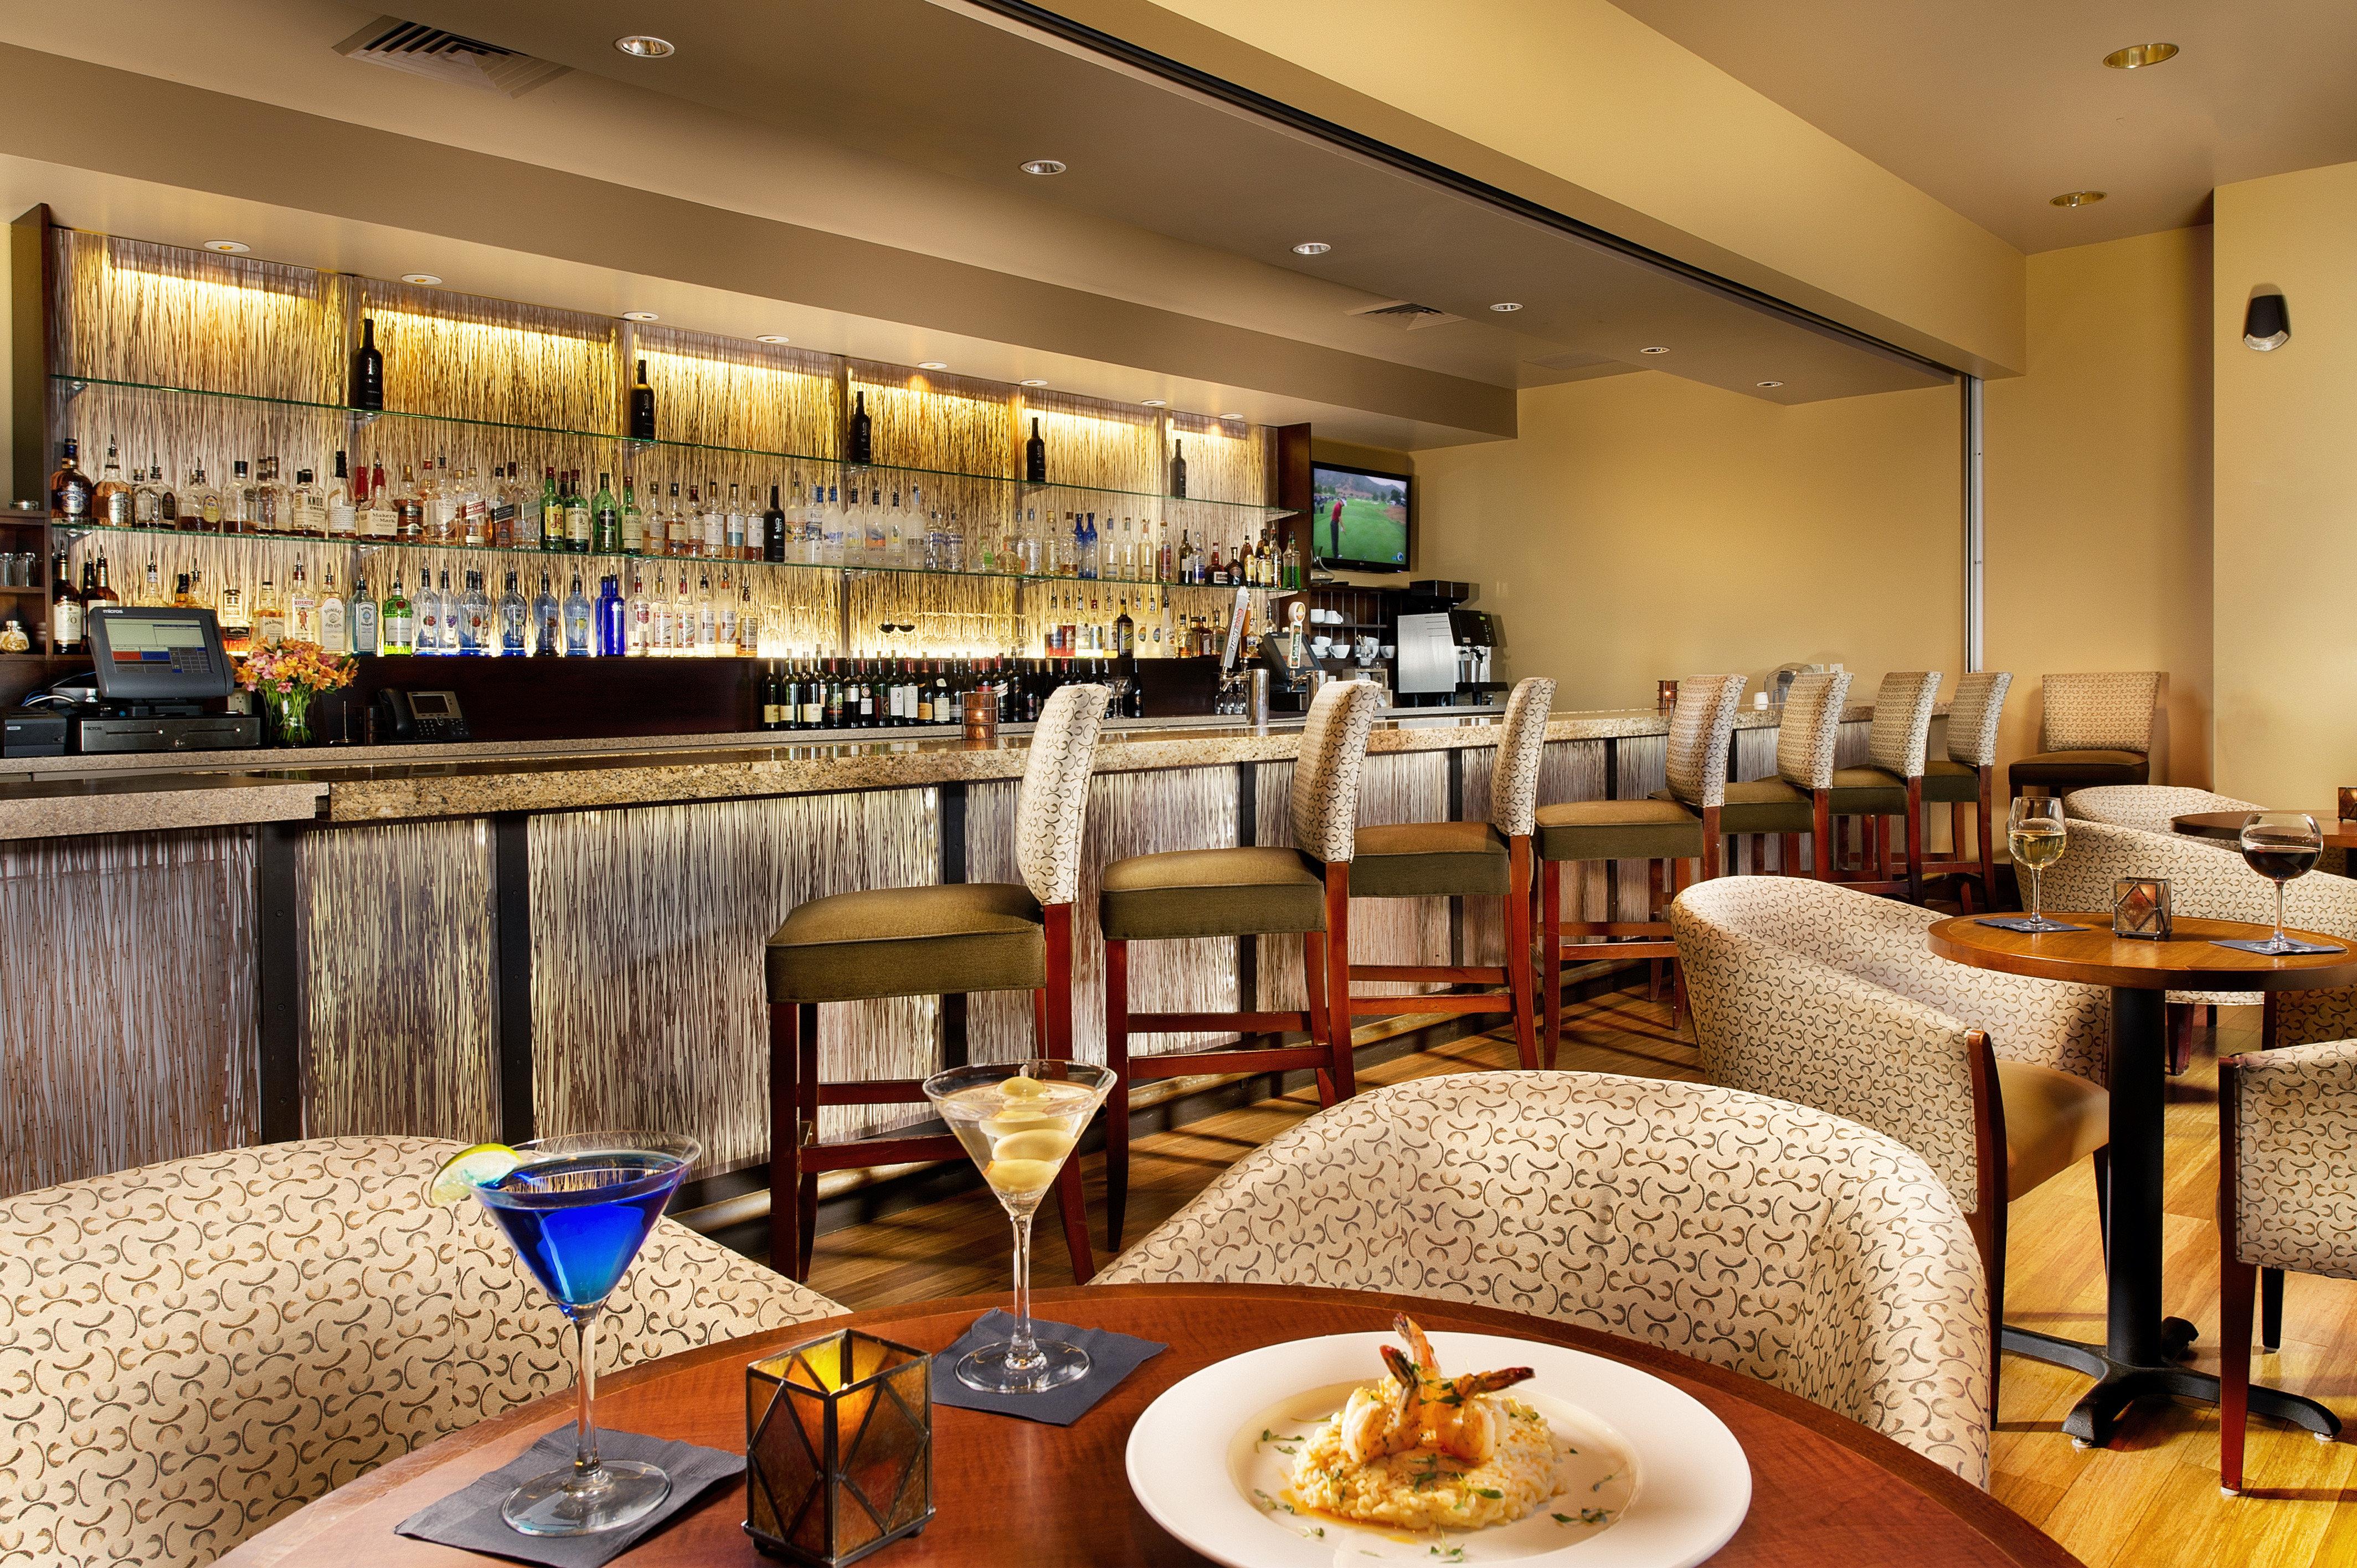 Bar Classic Dining Drink Eat Lounge Resort restaurant café Lobby function hall